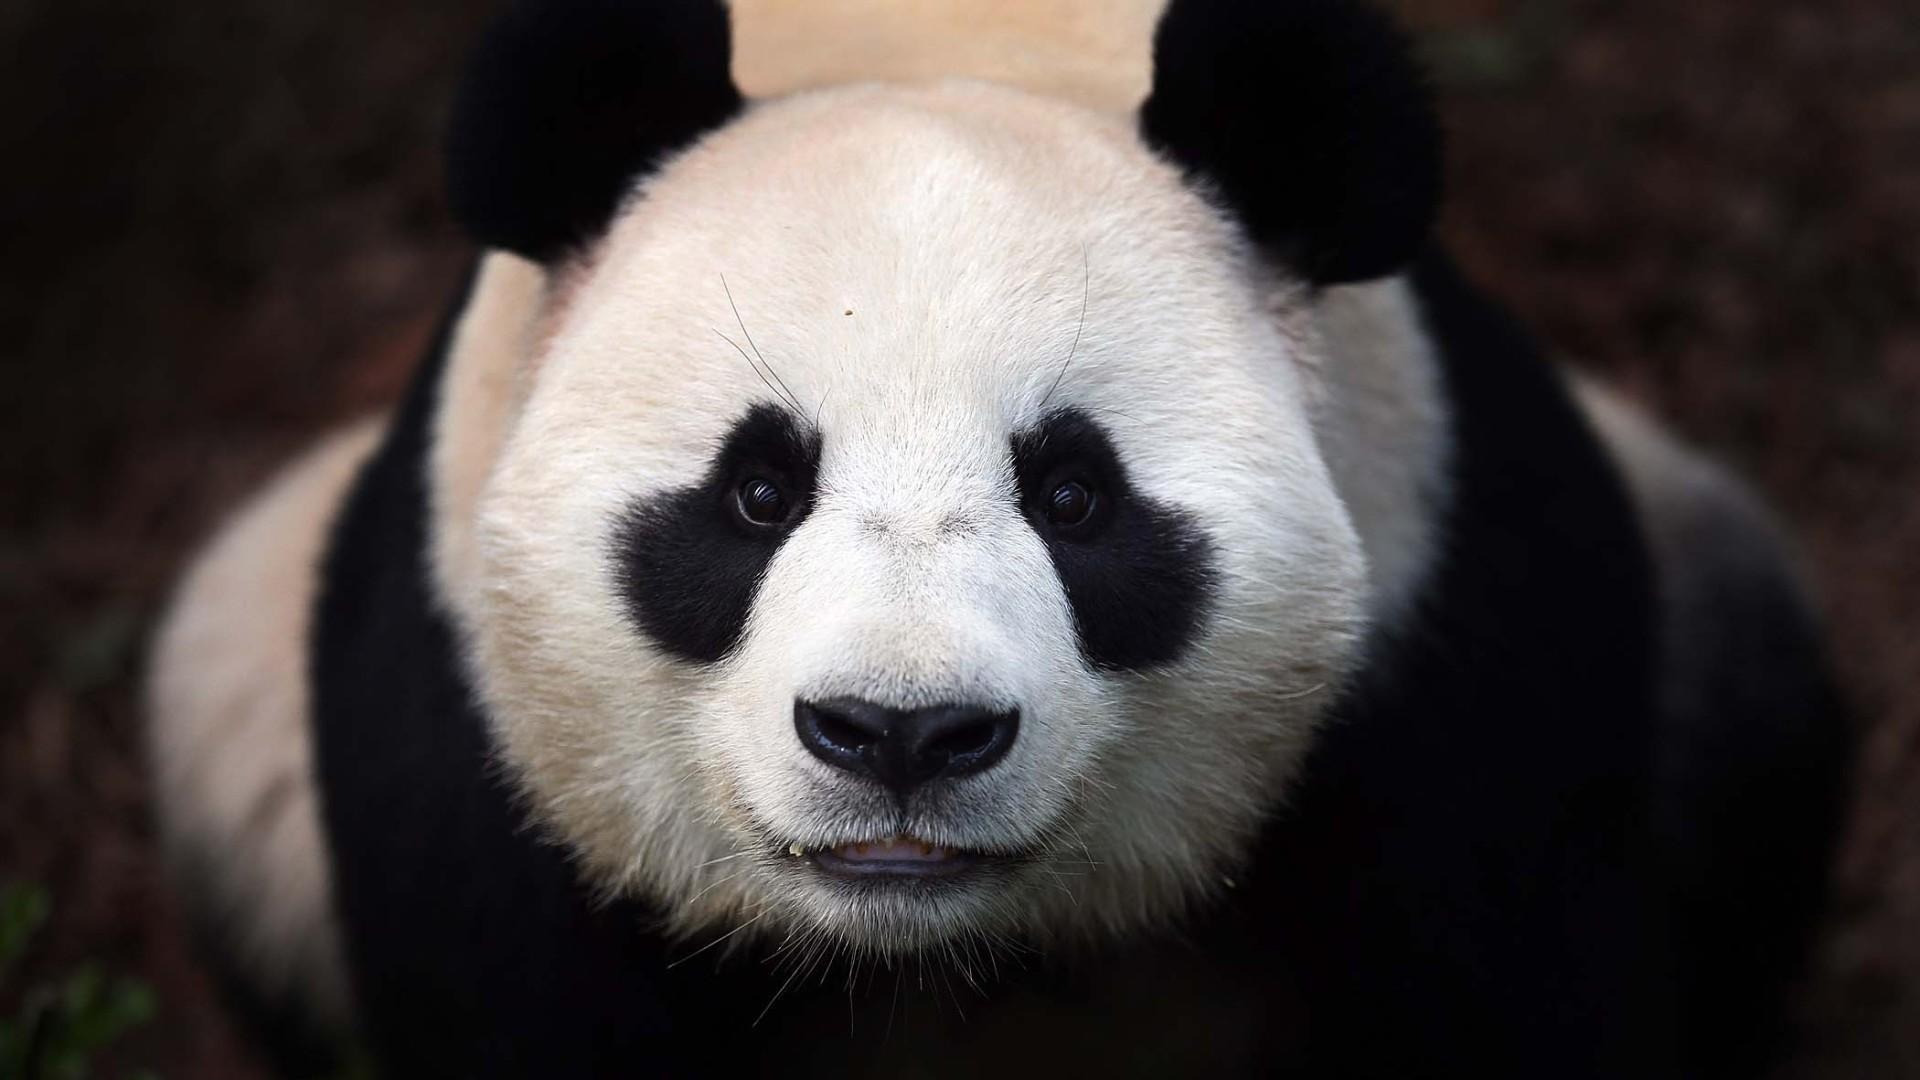 hinh gau truc panda 9